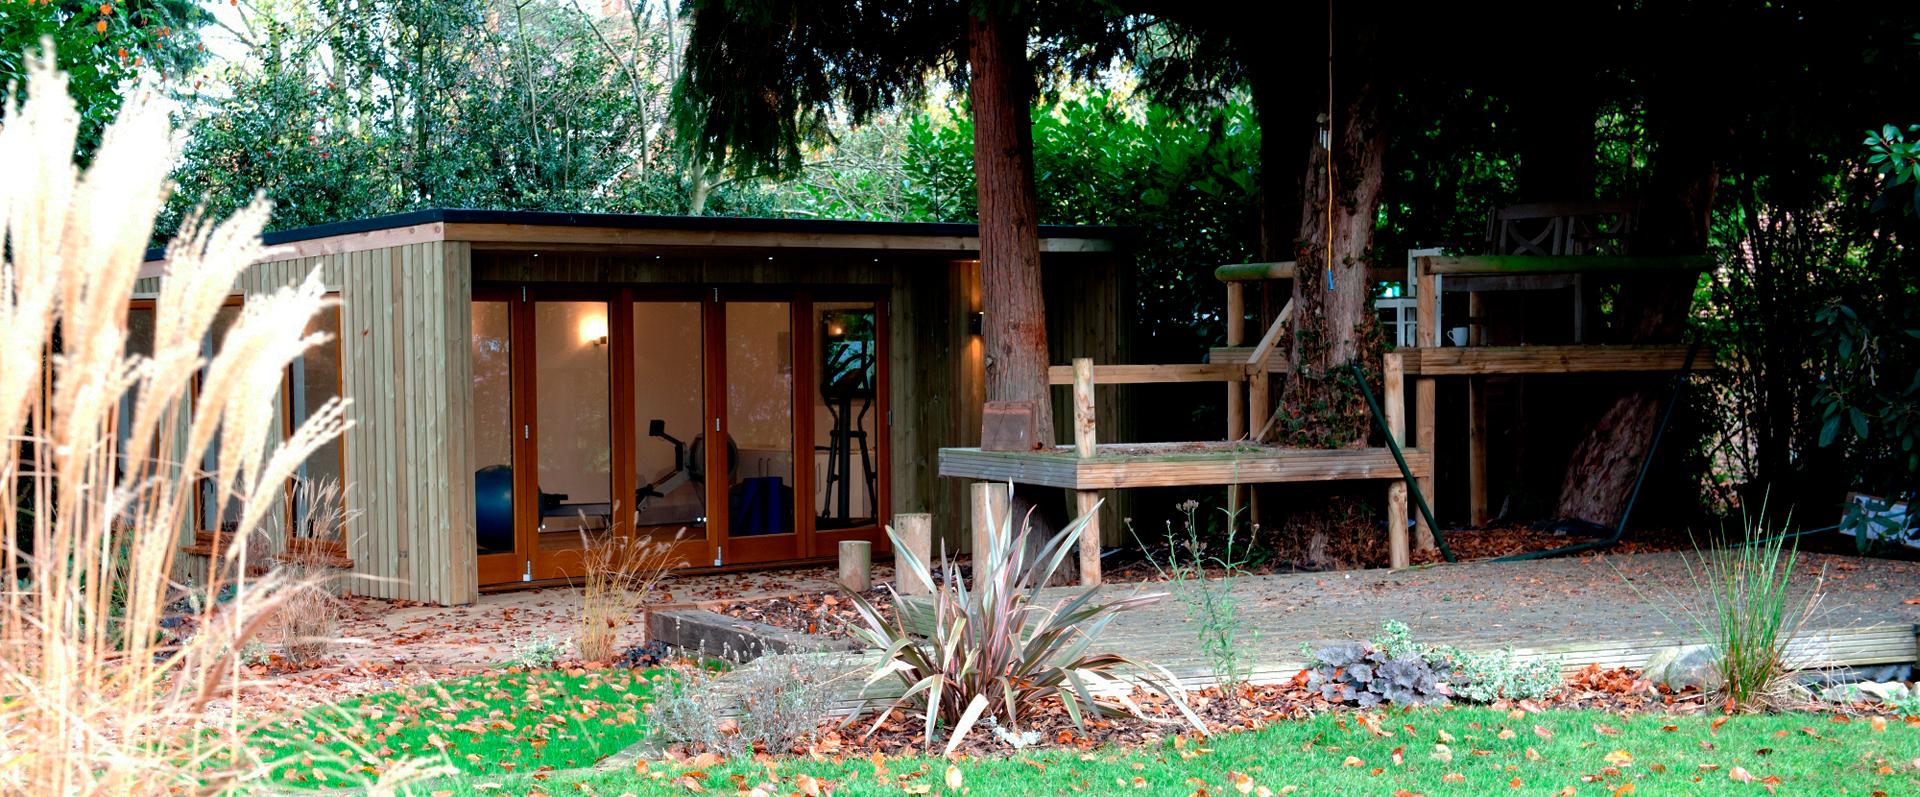 Successful garden design a new online garden design for Landscape design courses home study